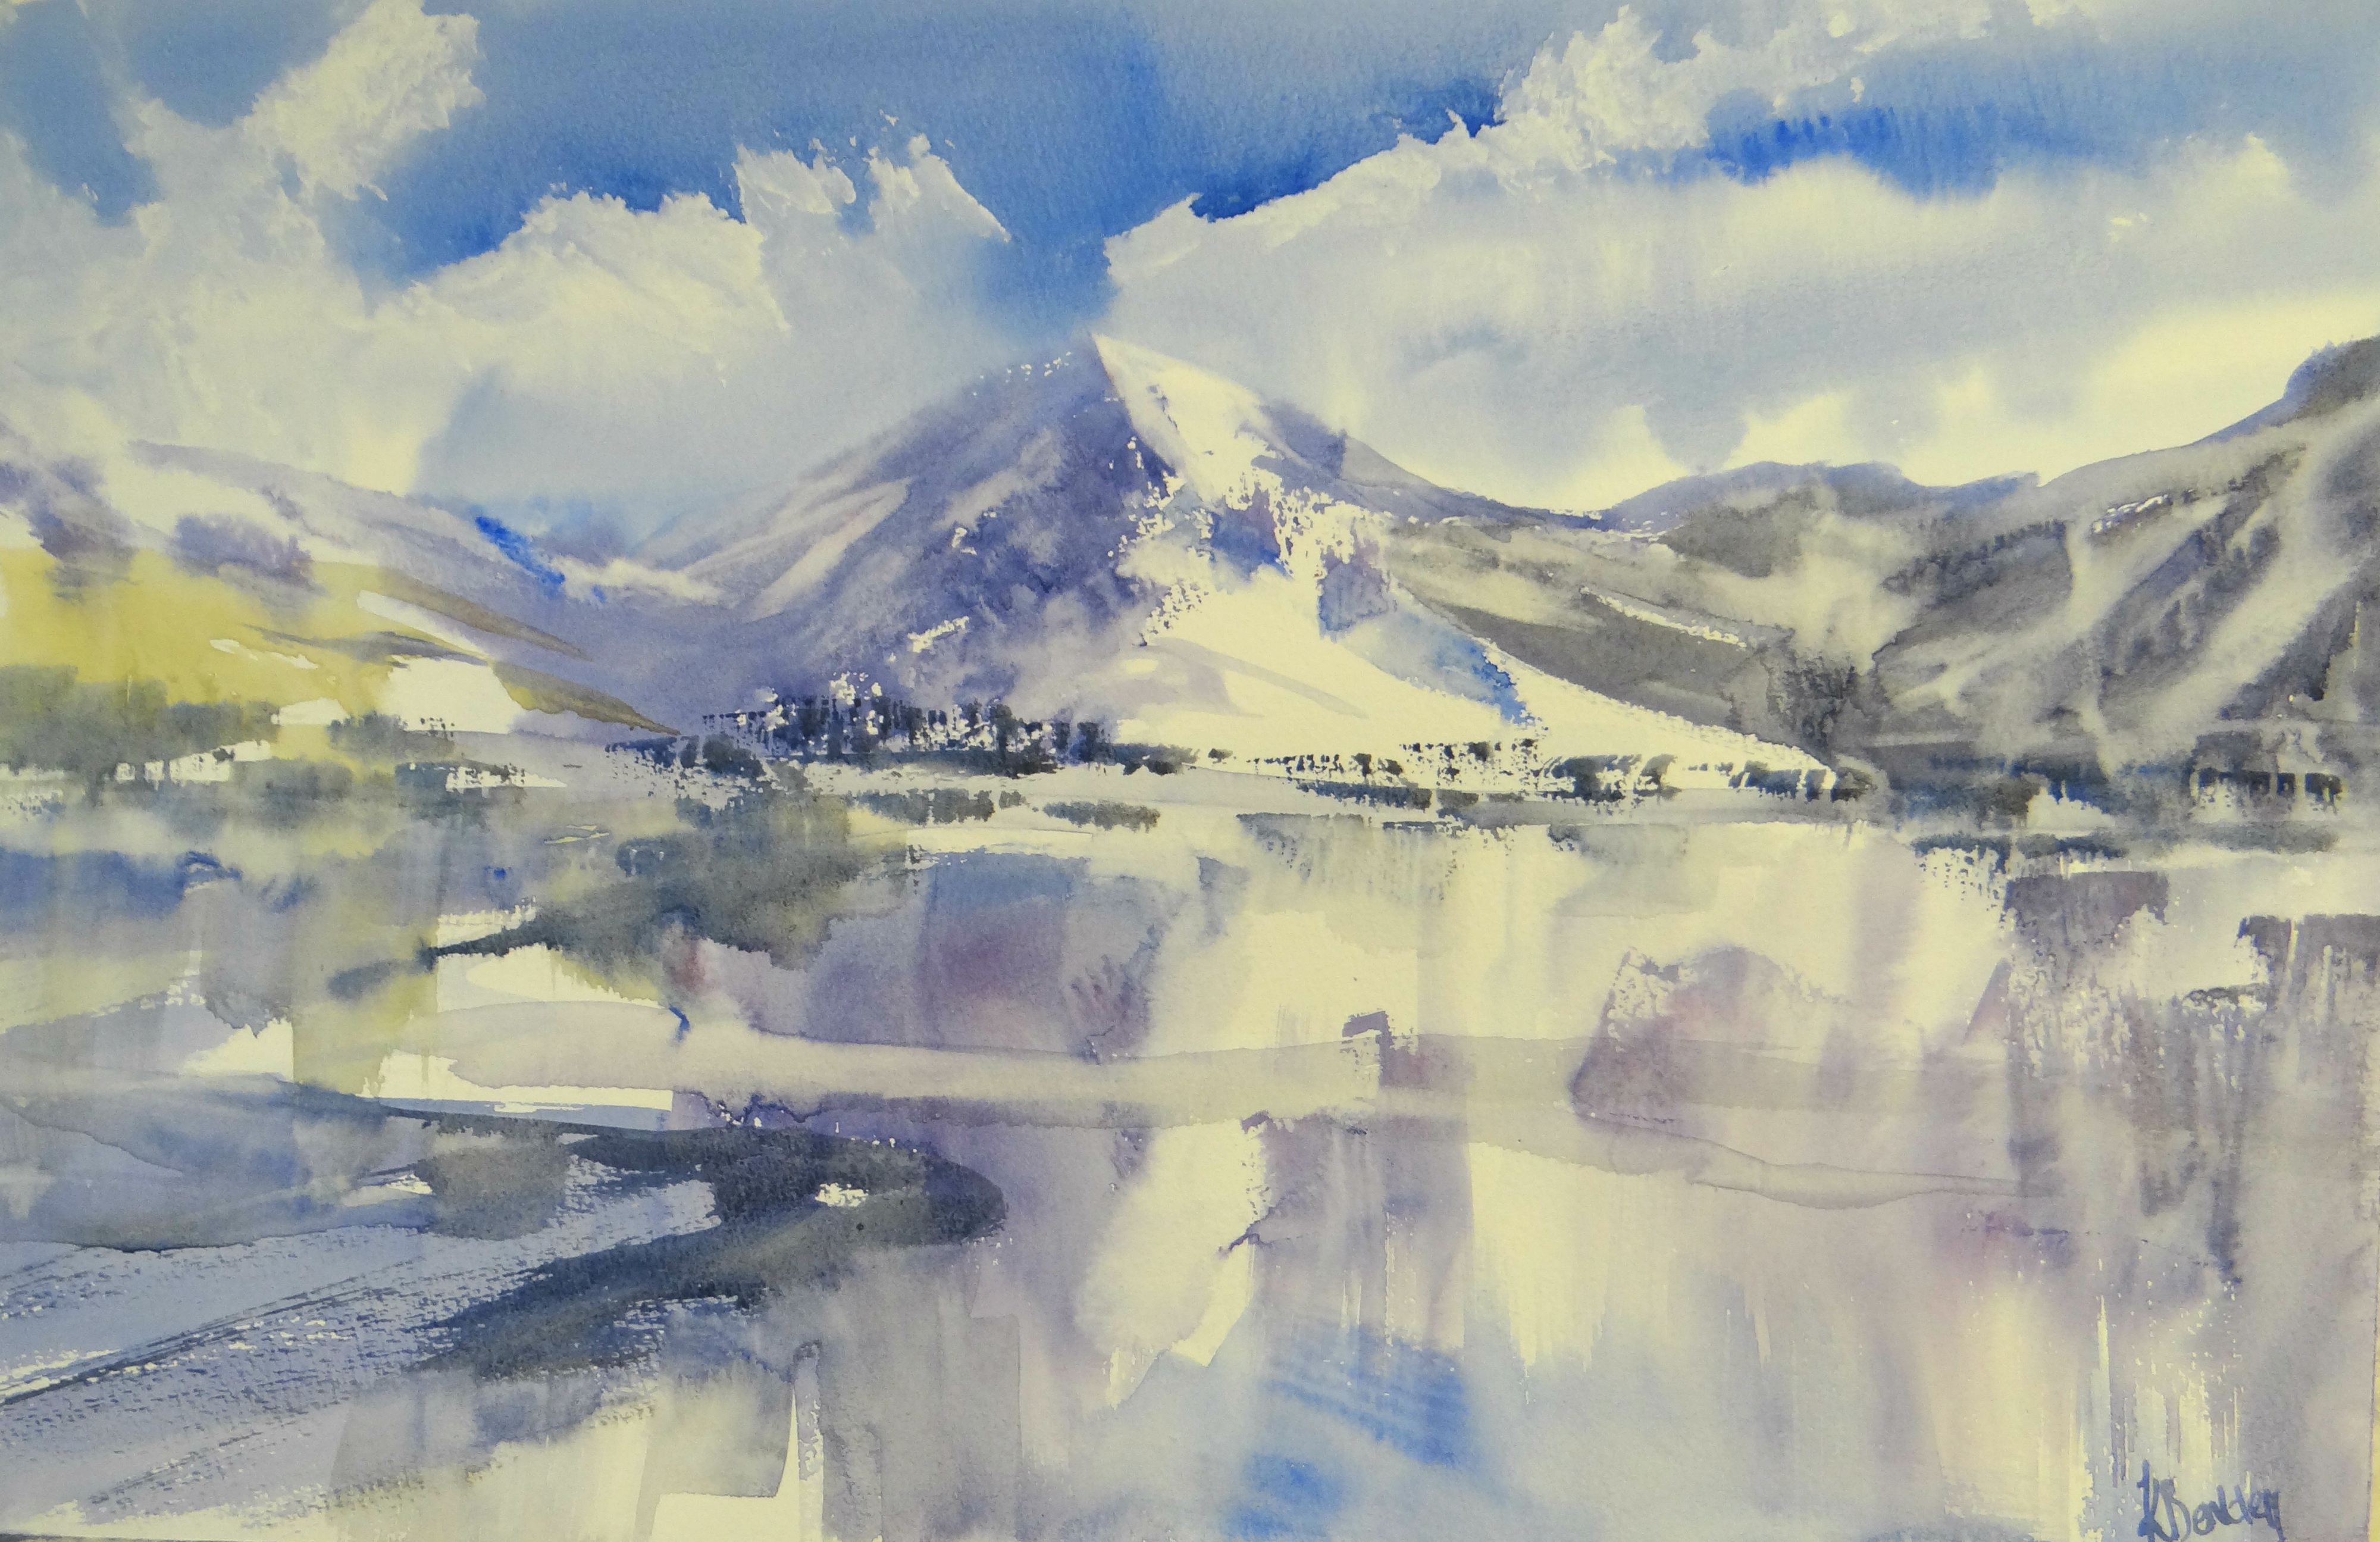 Snowy landscape - Painting